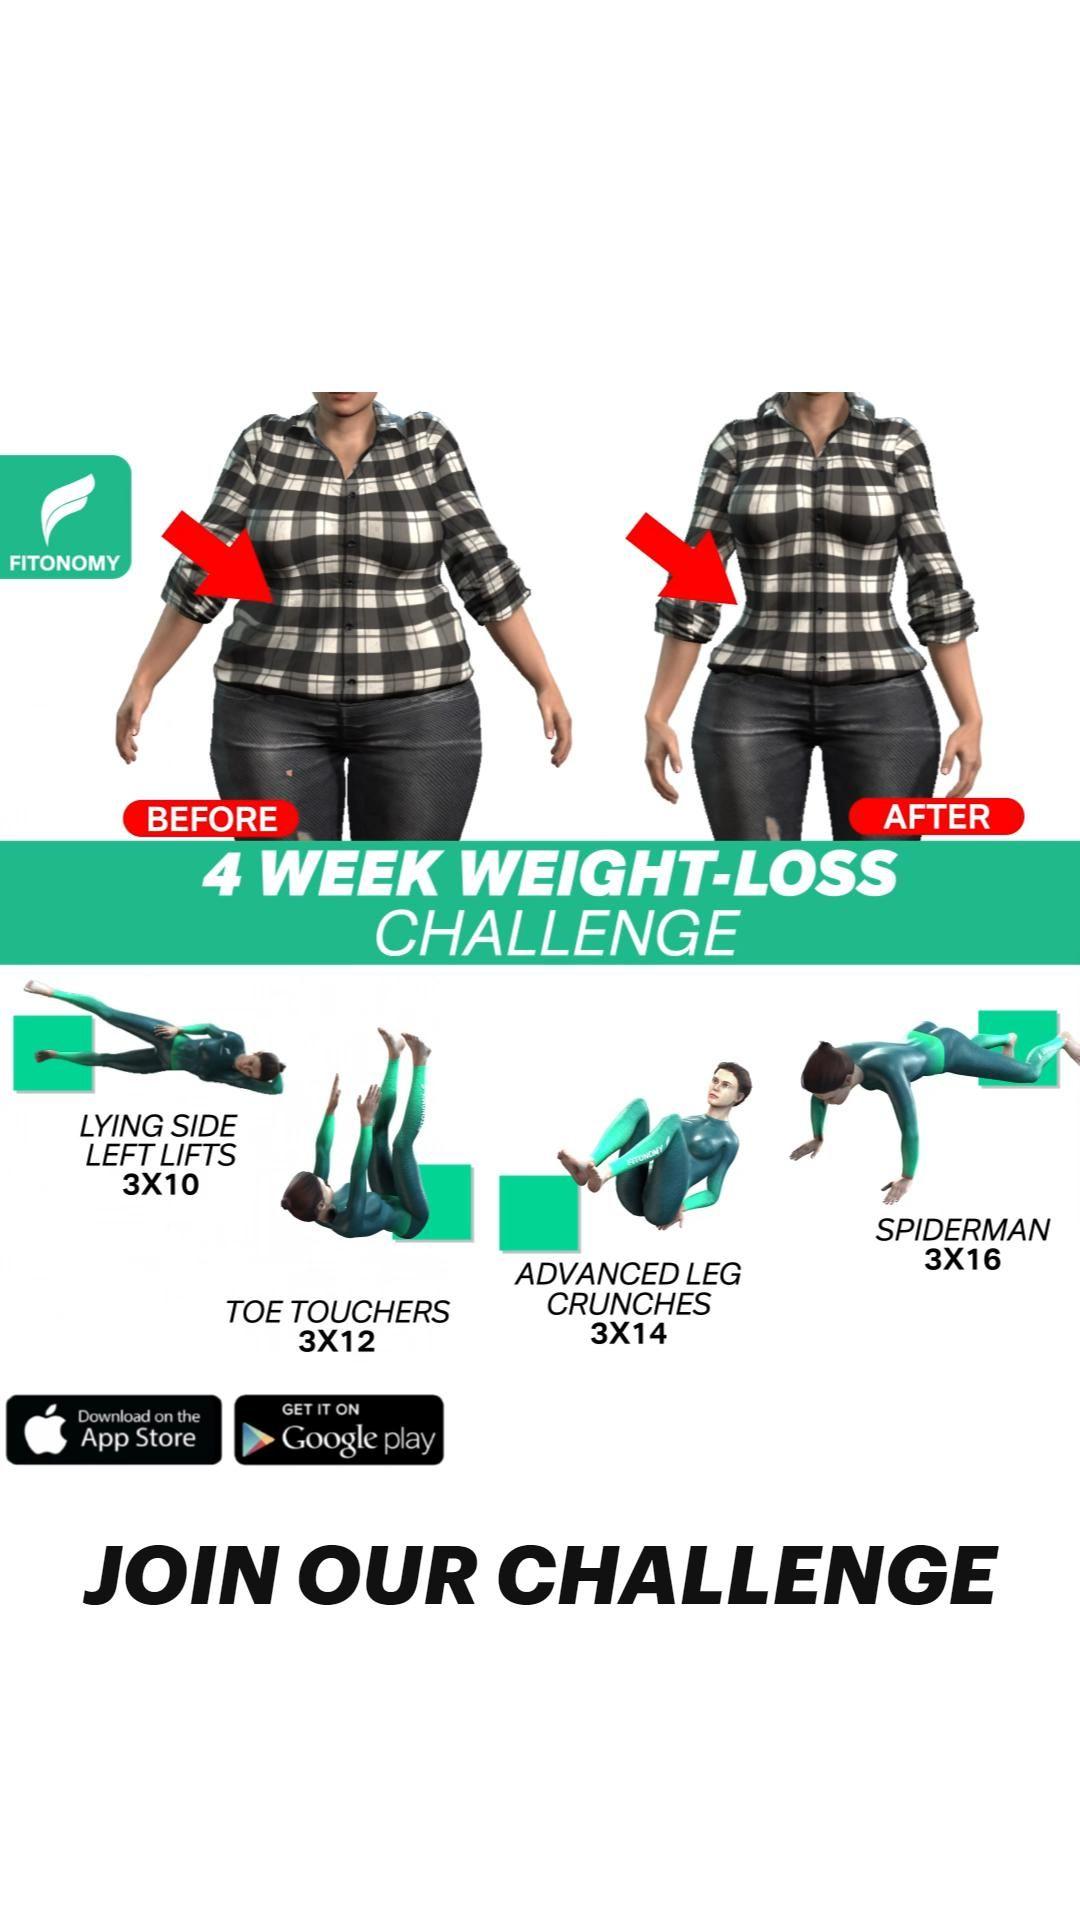 4 WEEK WEIGHT LOSS CHALLENGE